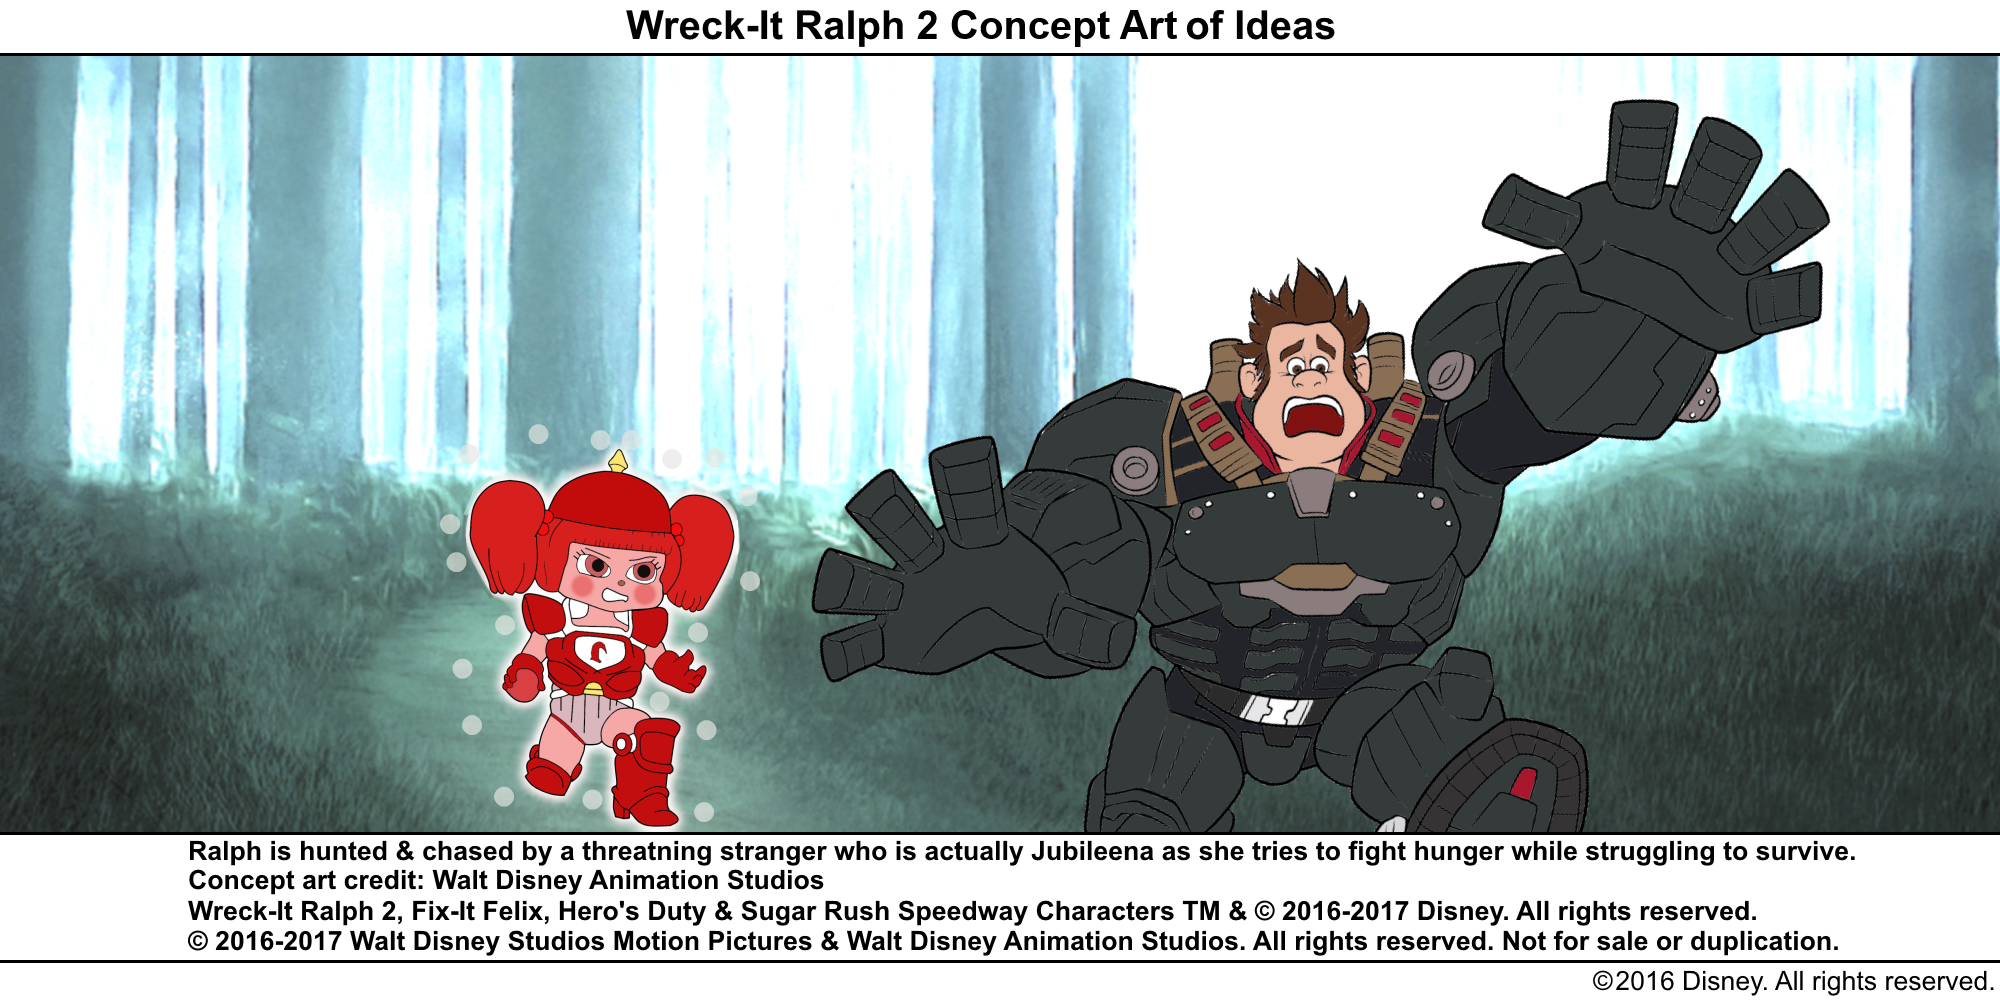 Best Lines From Wreck It Ralph 2: Wreck-It Ralph 2 Concept Art Of Ideas 7.png